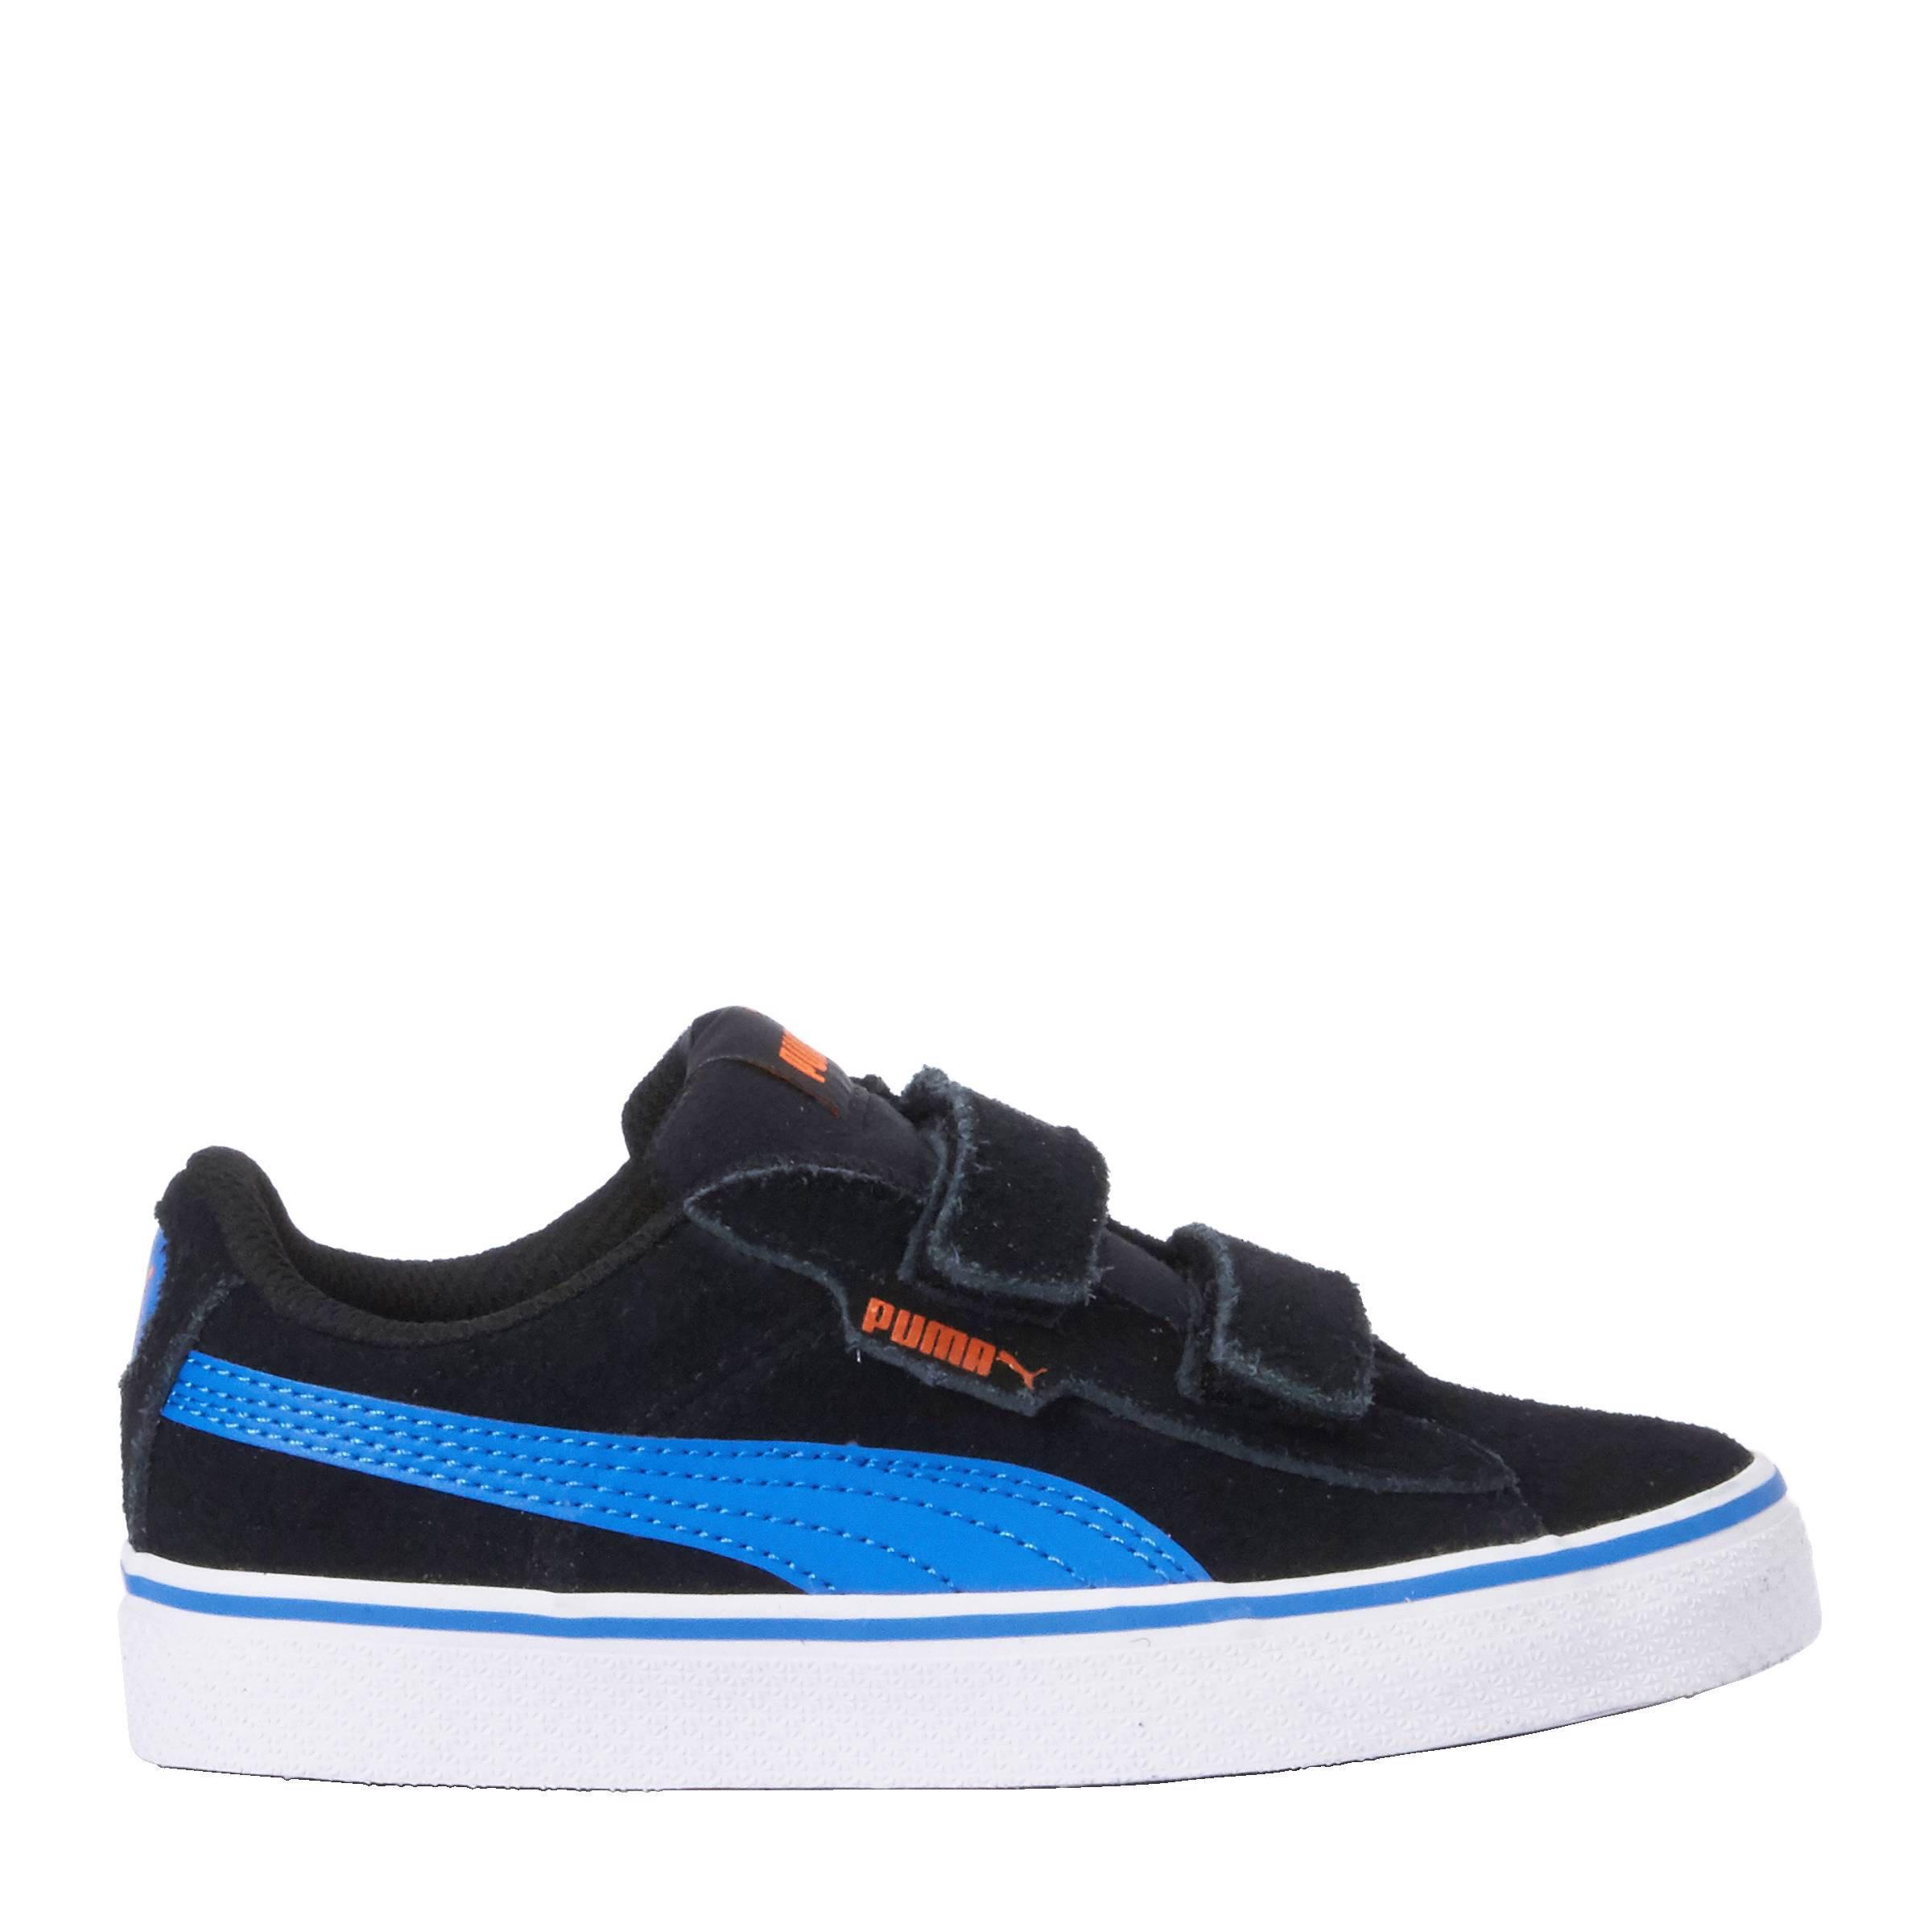 1948 Vulc V PS sneakers